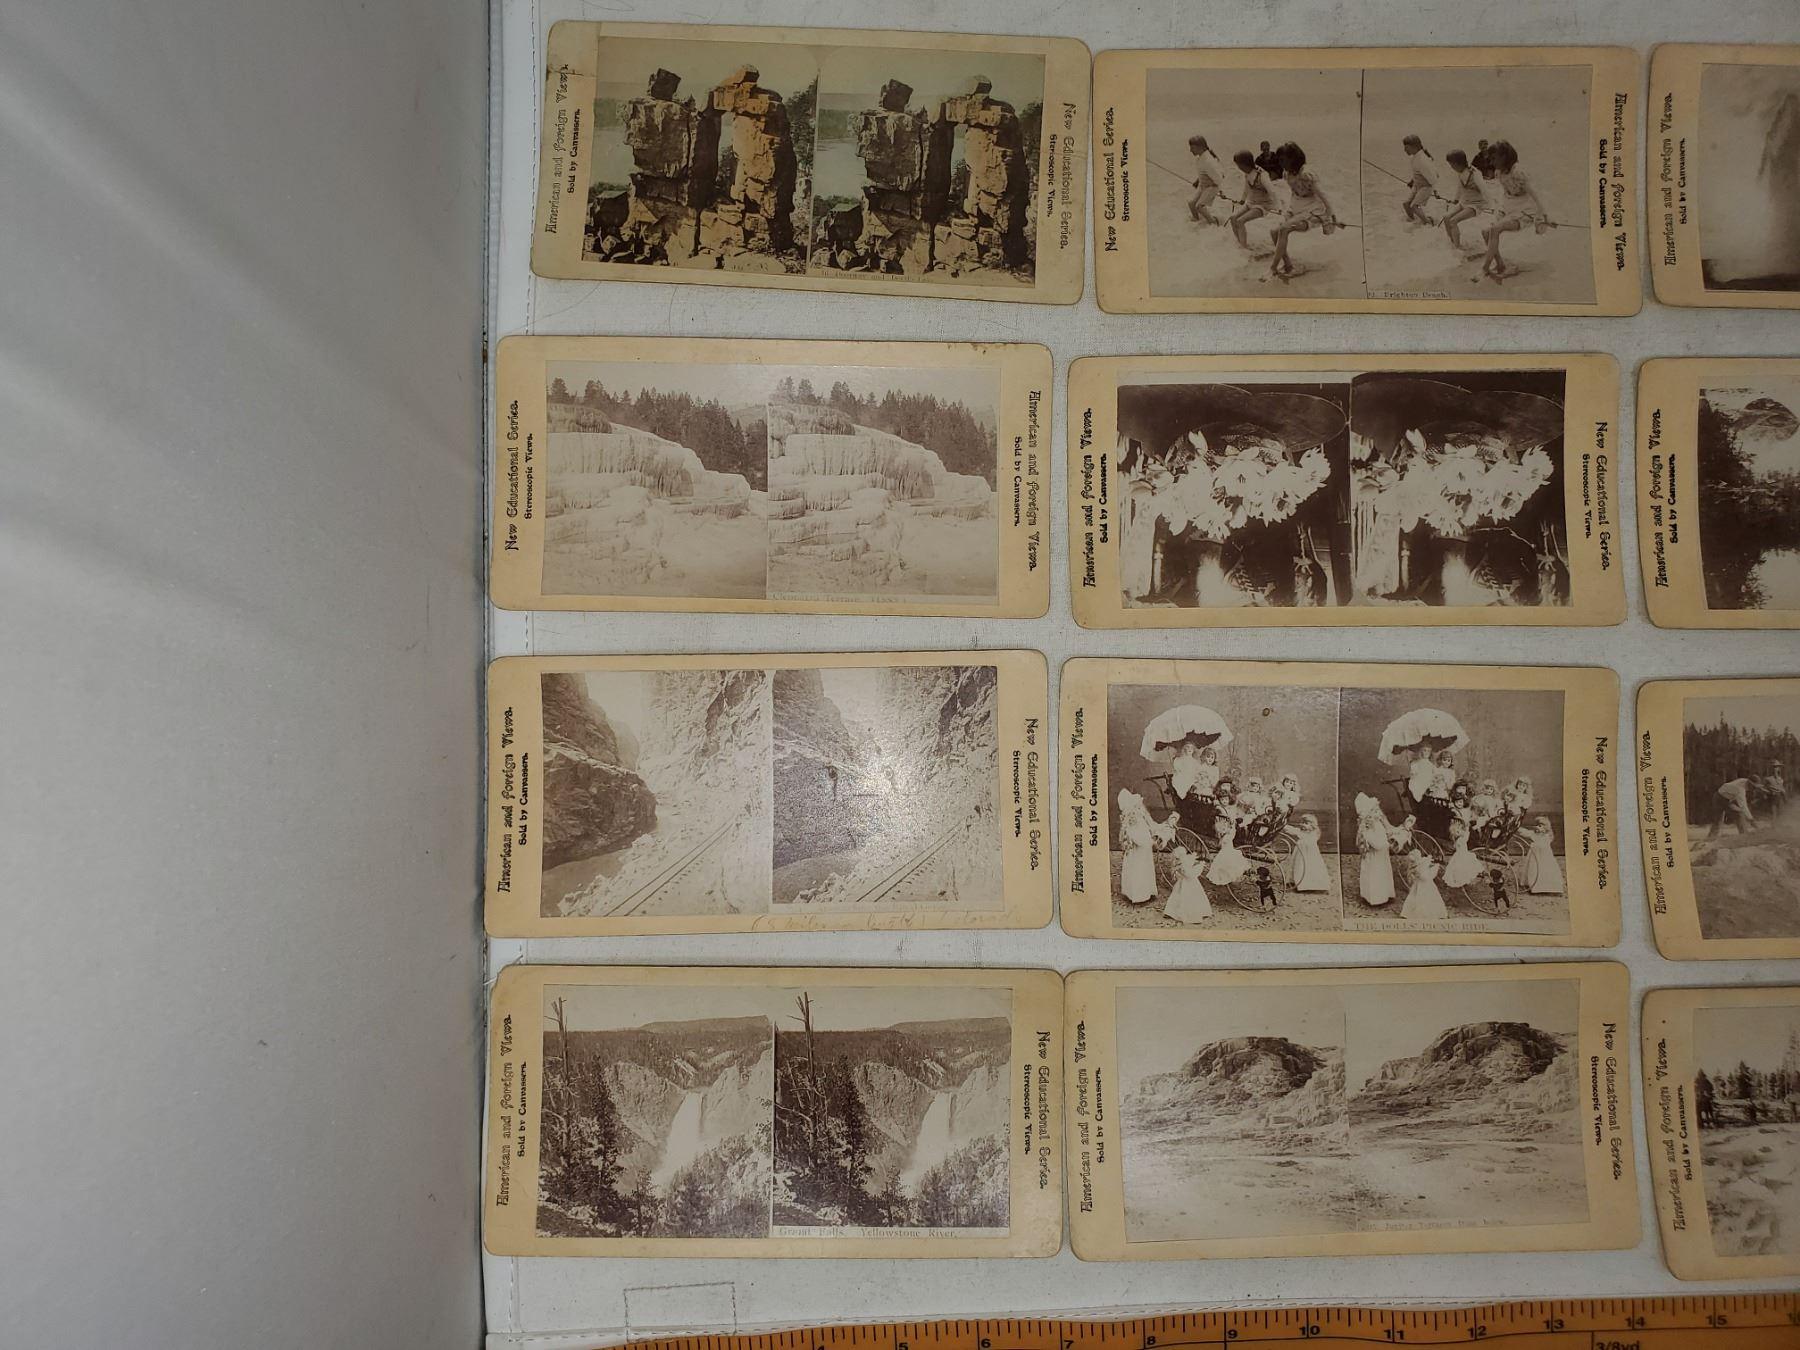 STEREOSCOPE CARDS (EDUCATING) 16 VIEWS